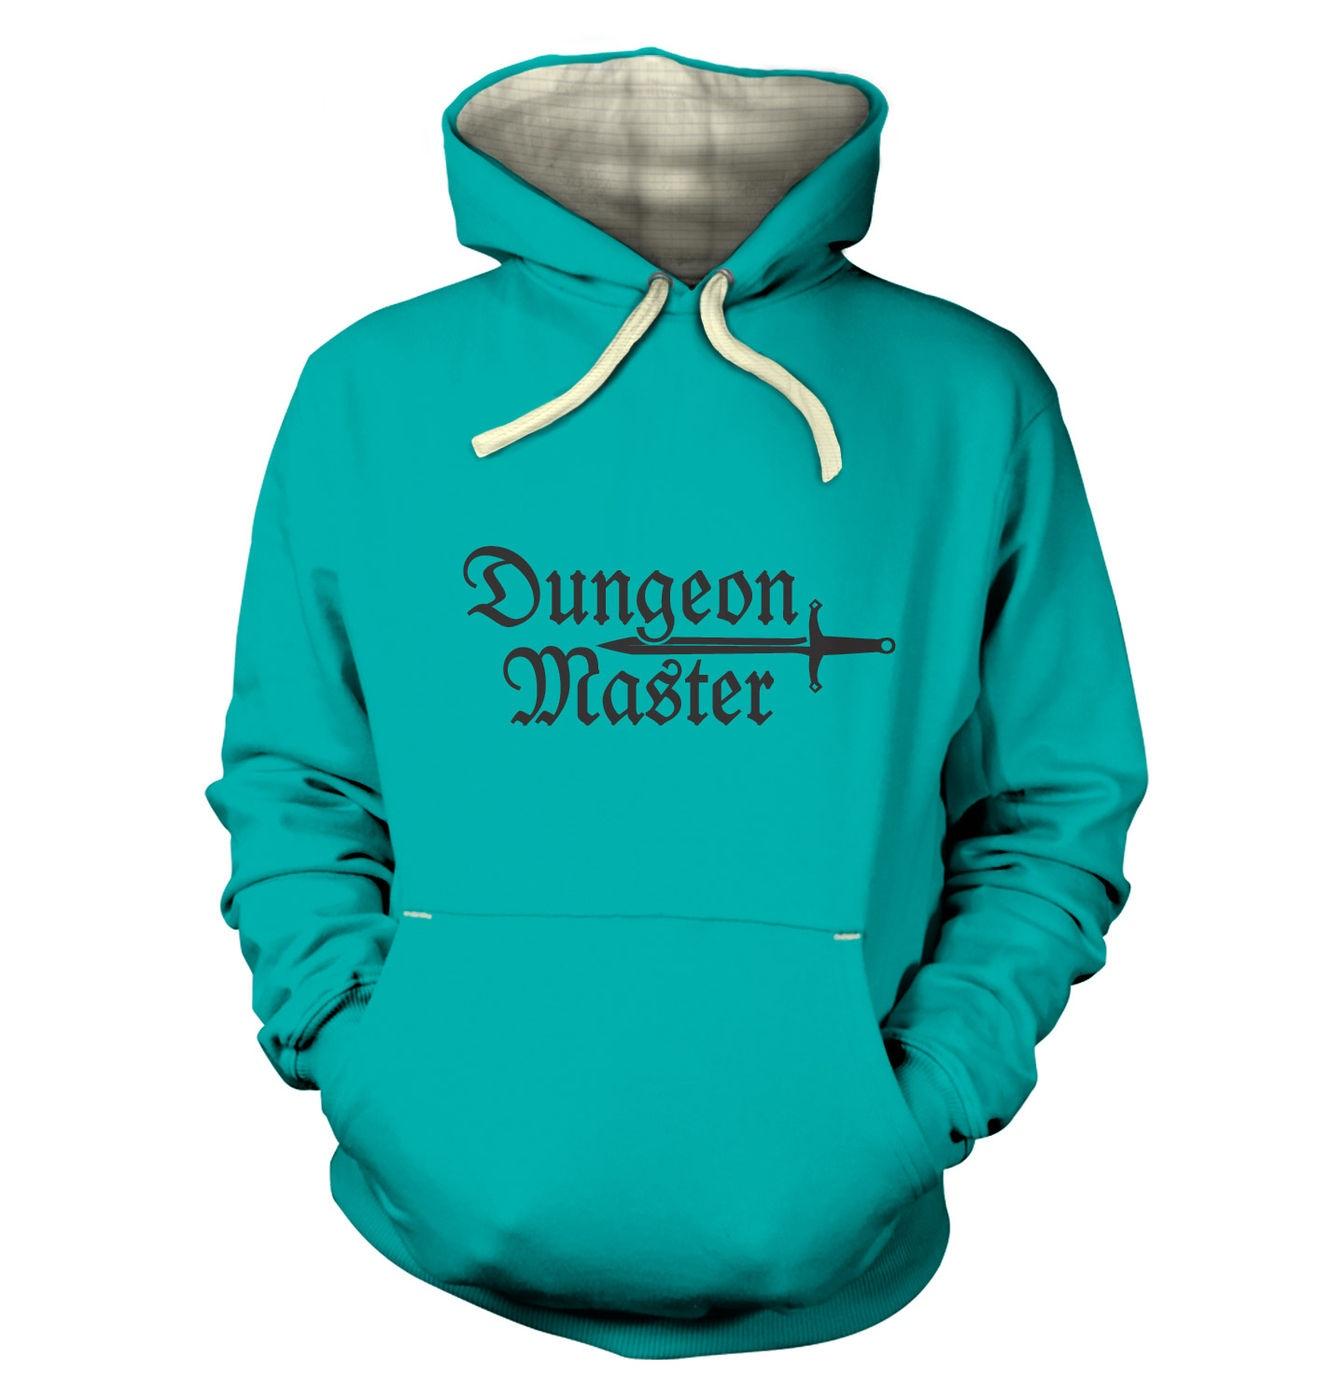 Dungeon Master premium hoodie